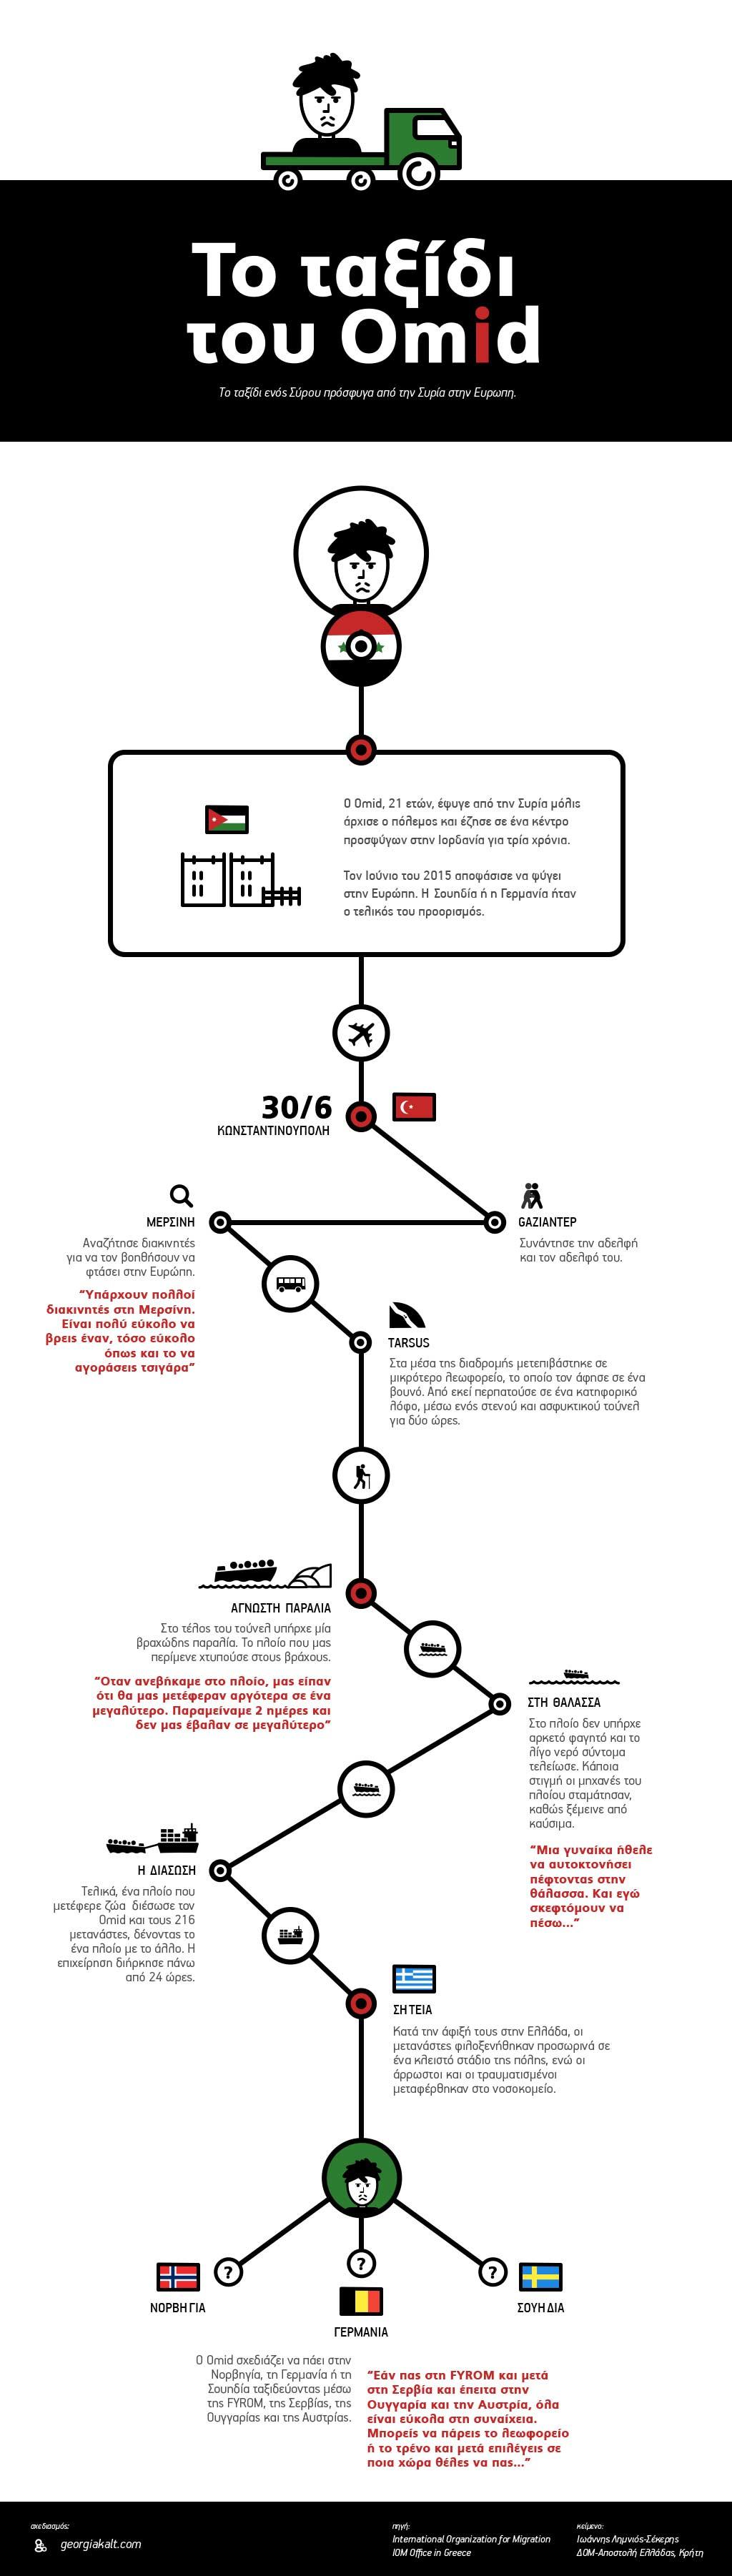 omid's-journey_infographic_by_georgia_kalt_2_big